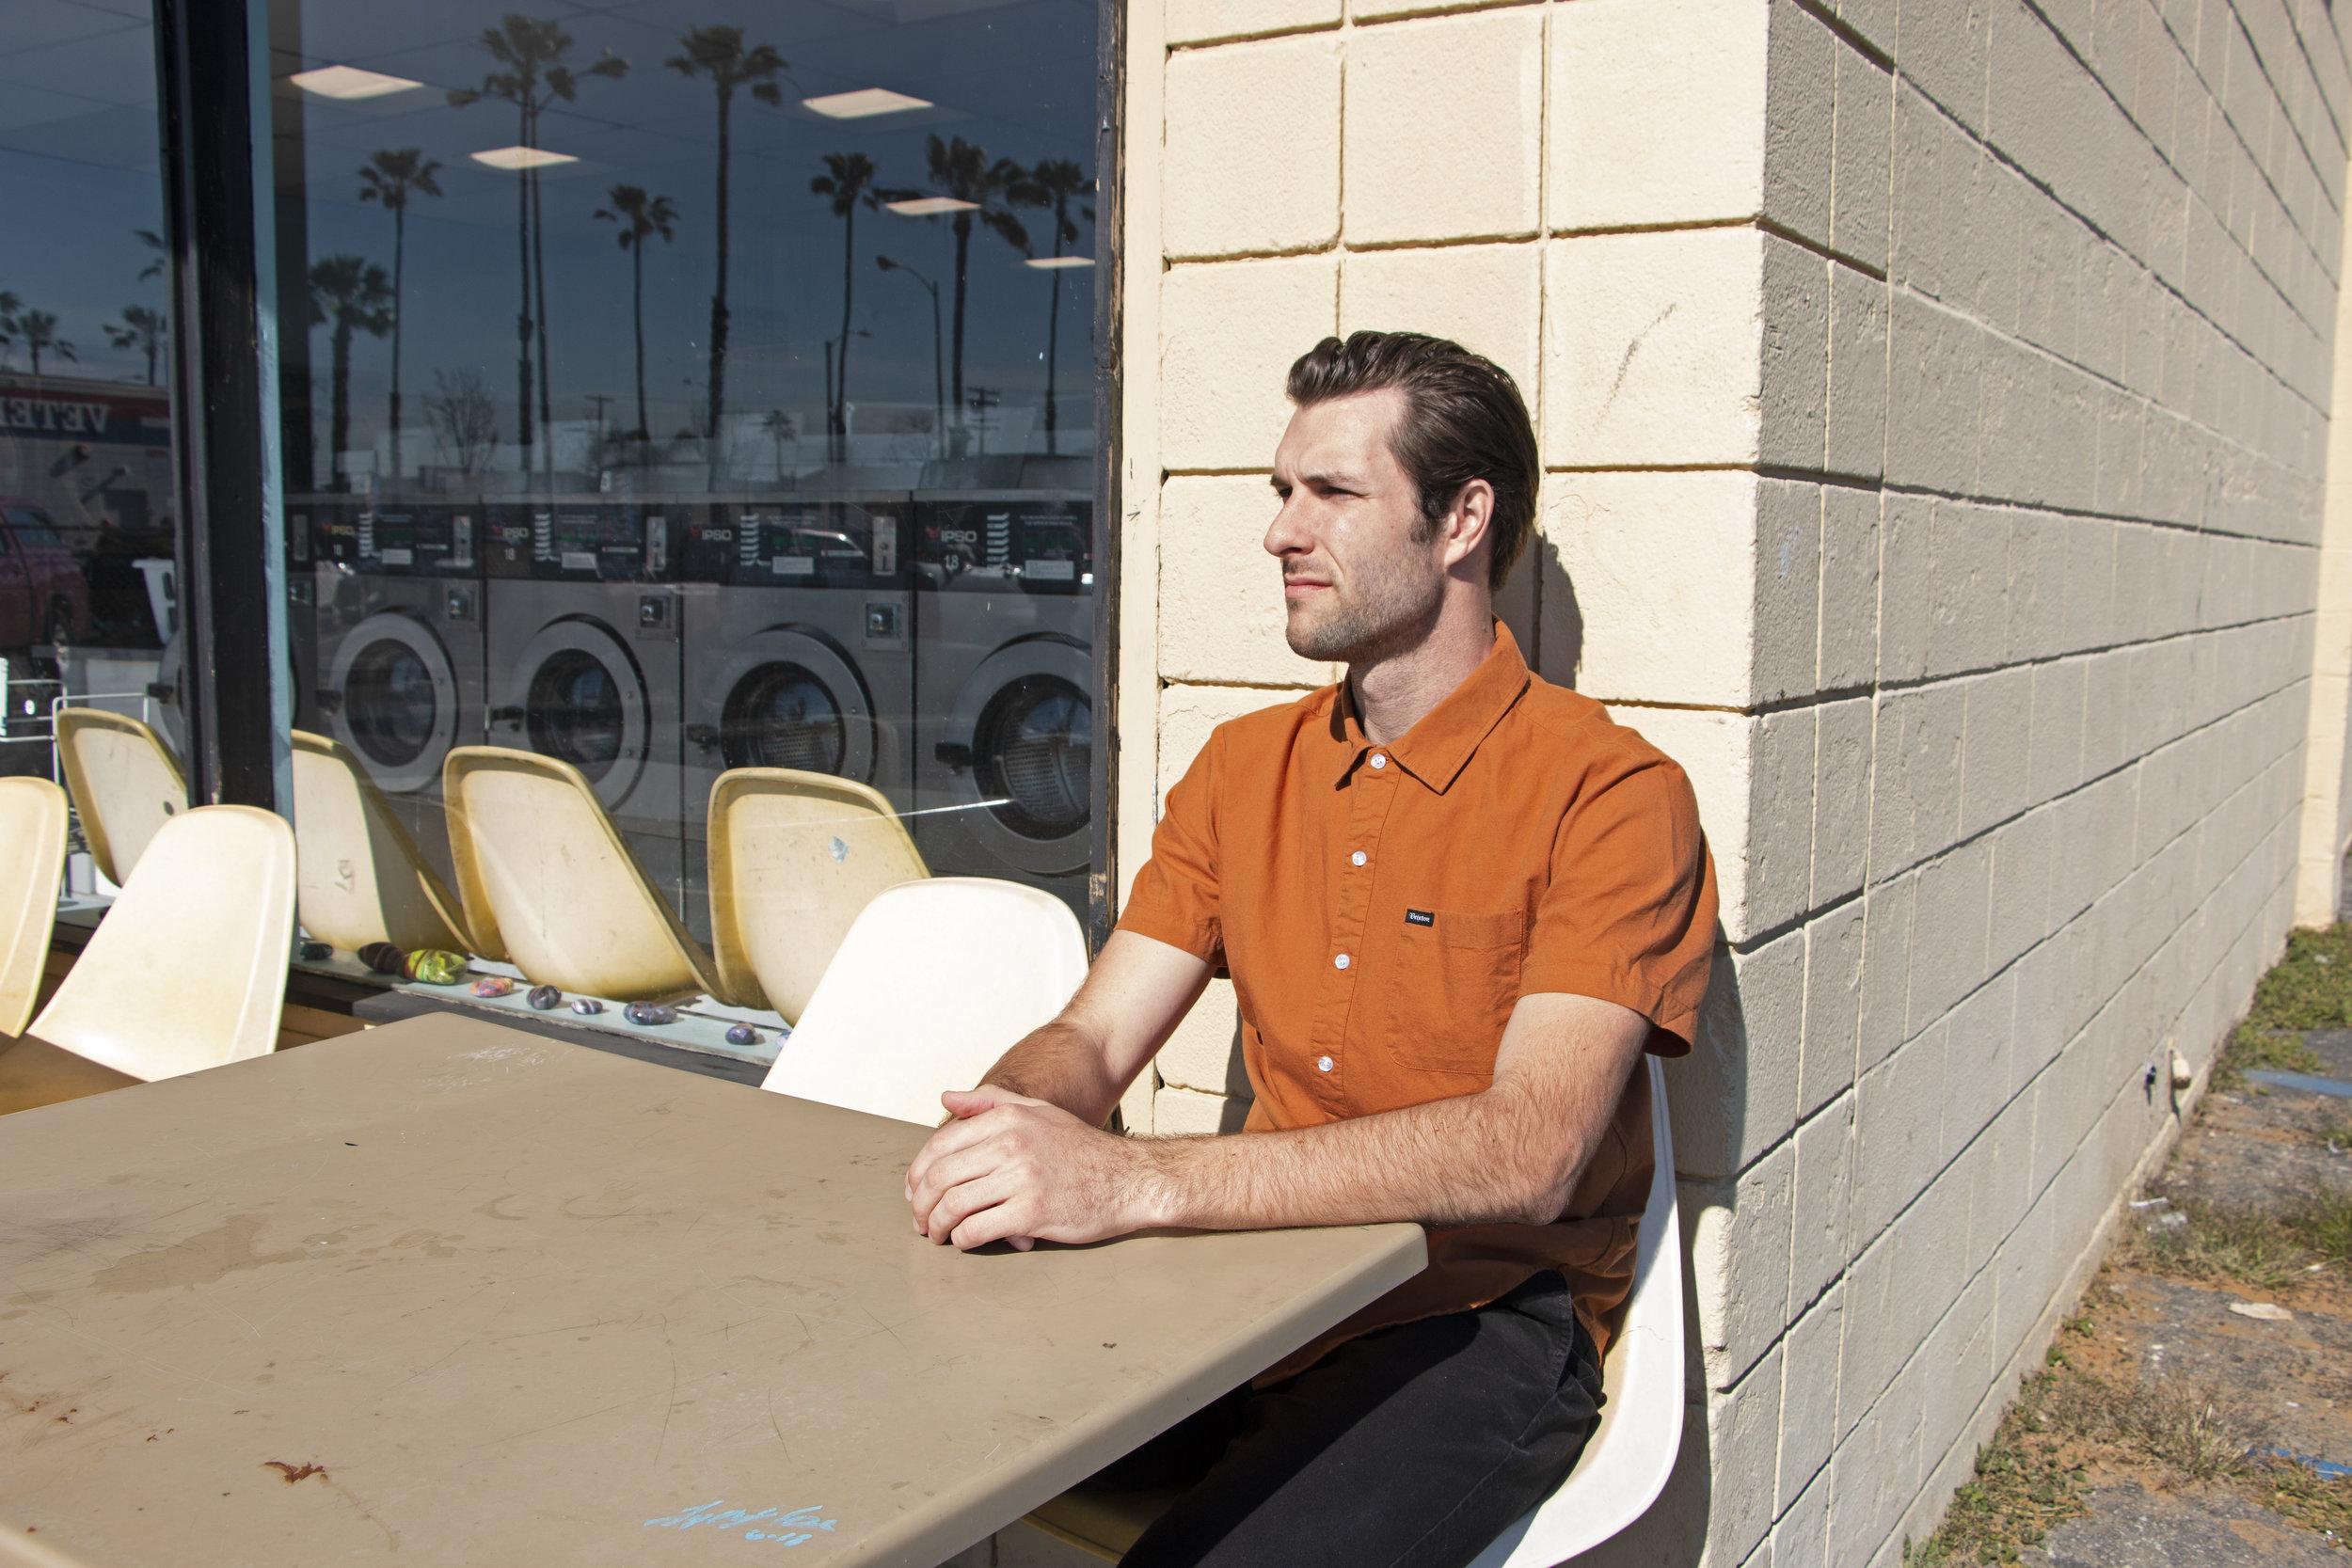 Josh_Orange Button Up_Laundry_4.jpg